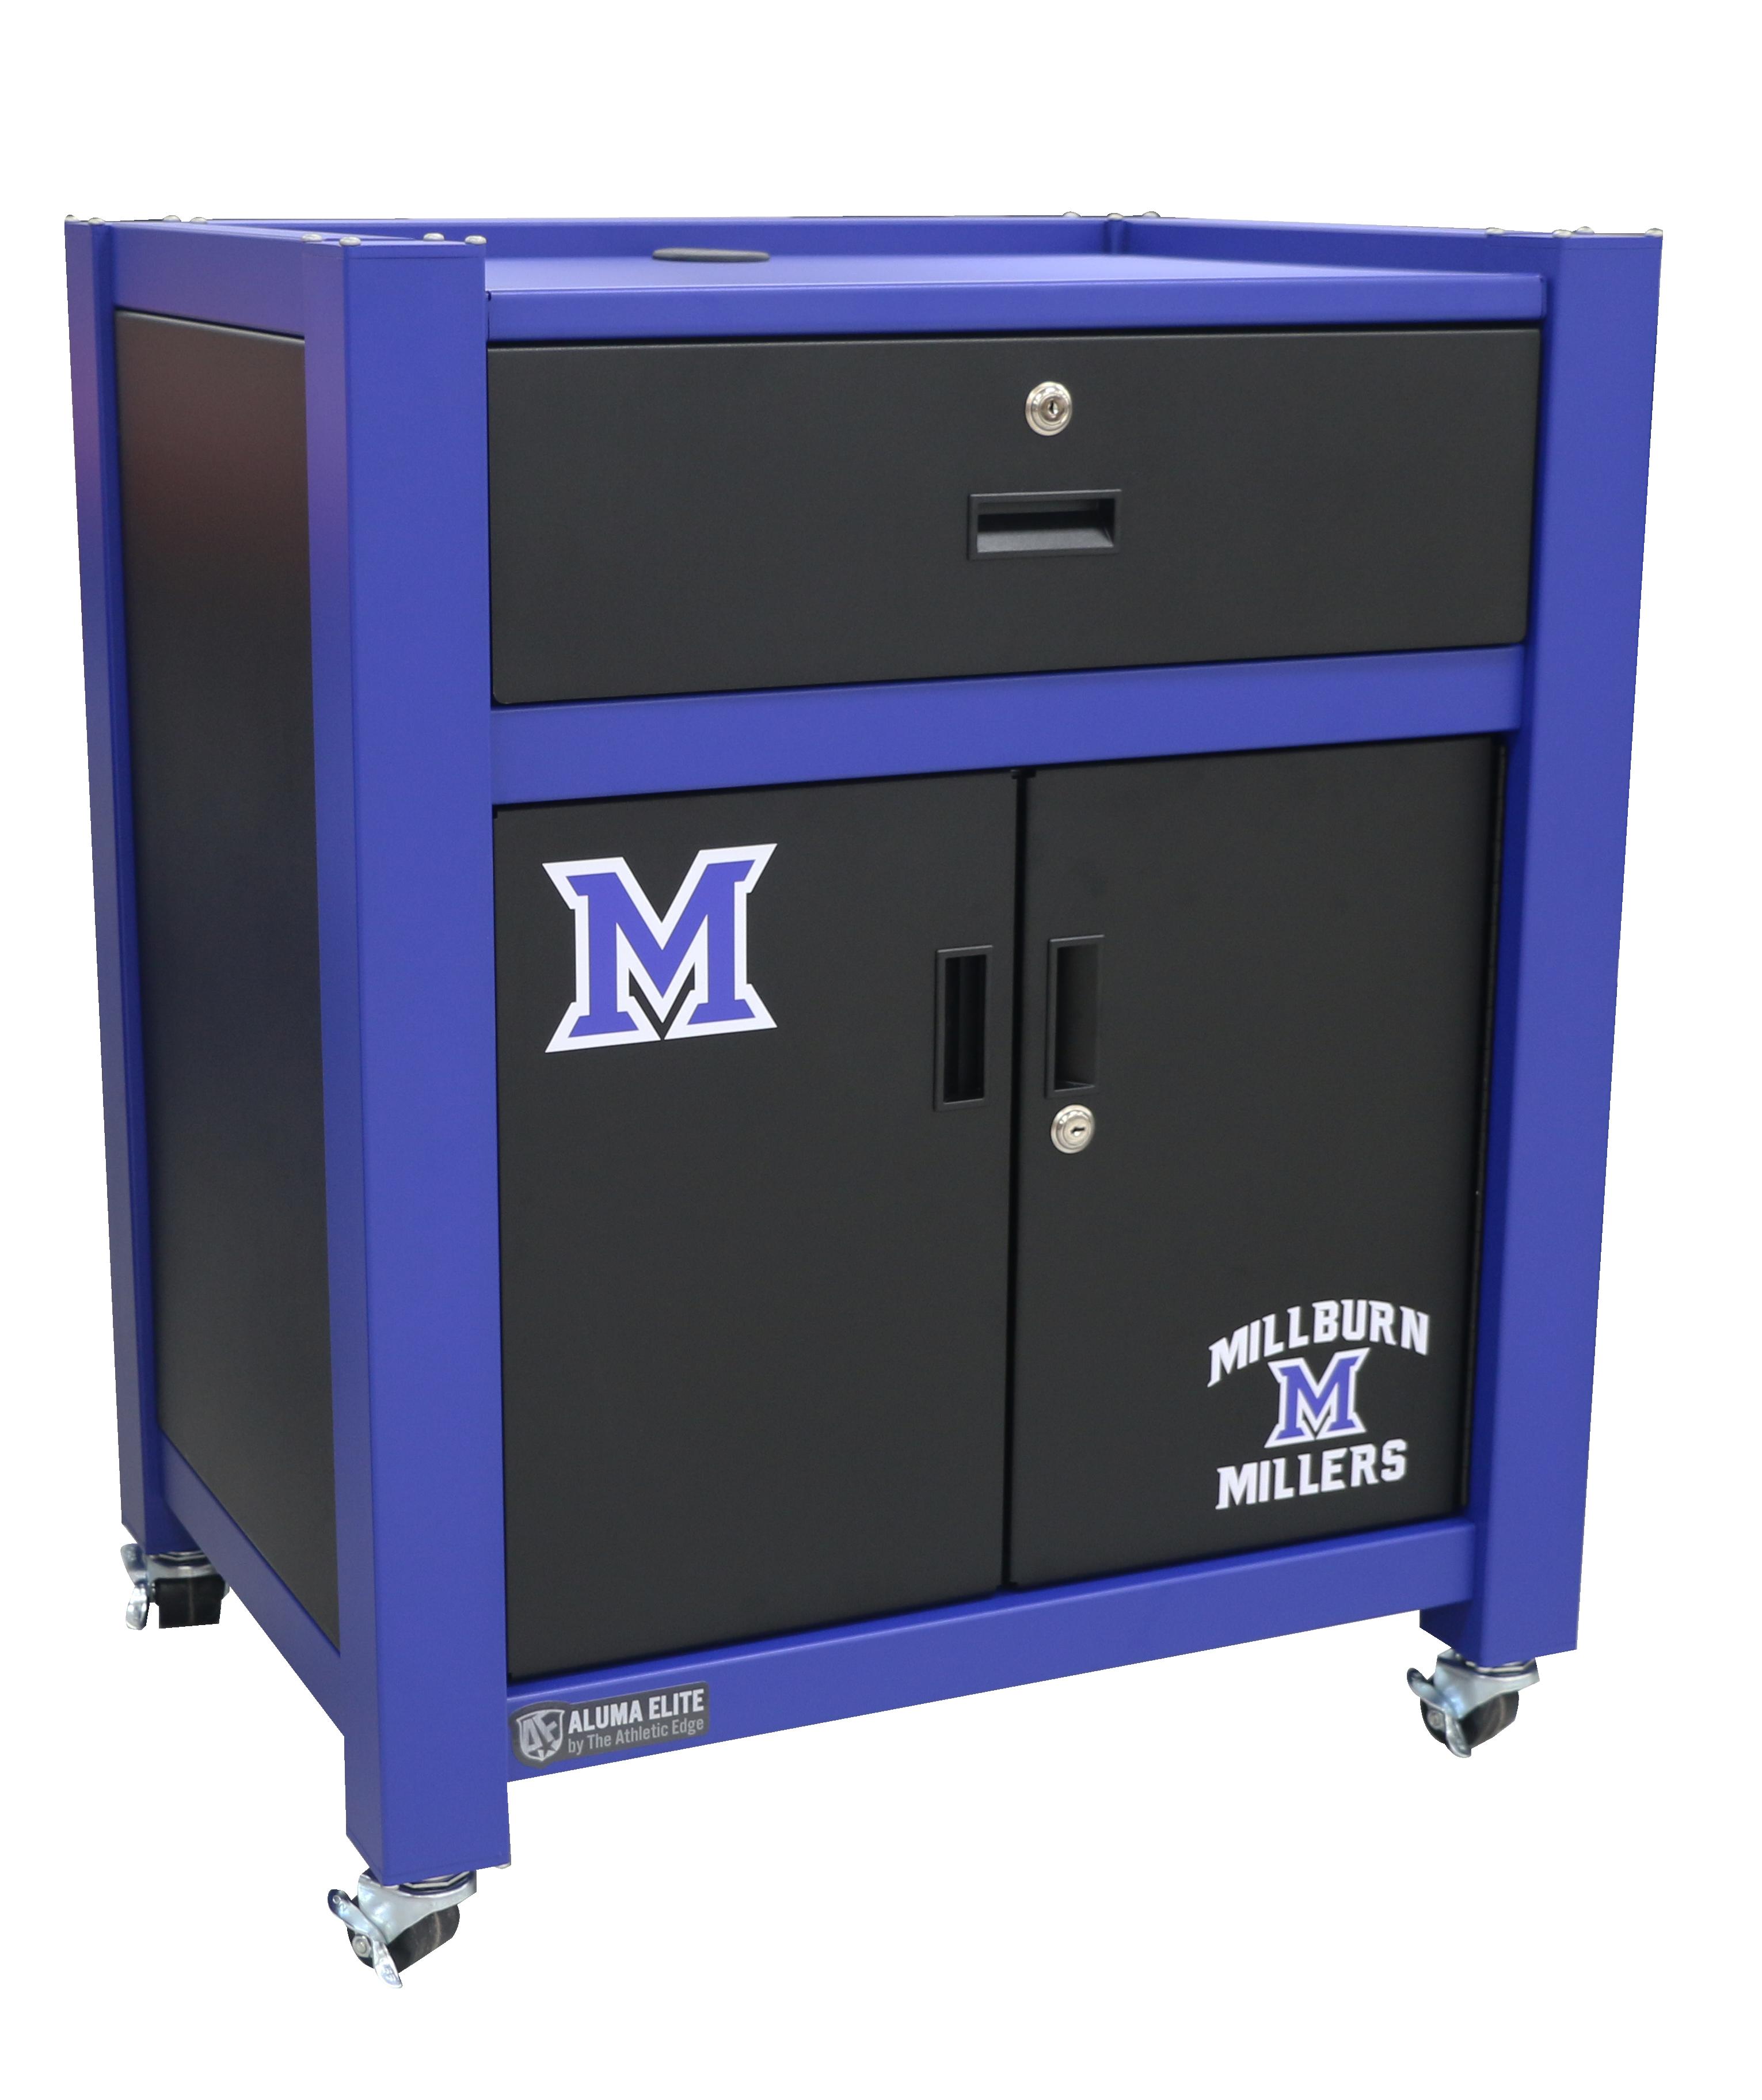 Millburn HS-(Aluma Elite Modality Cart)